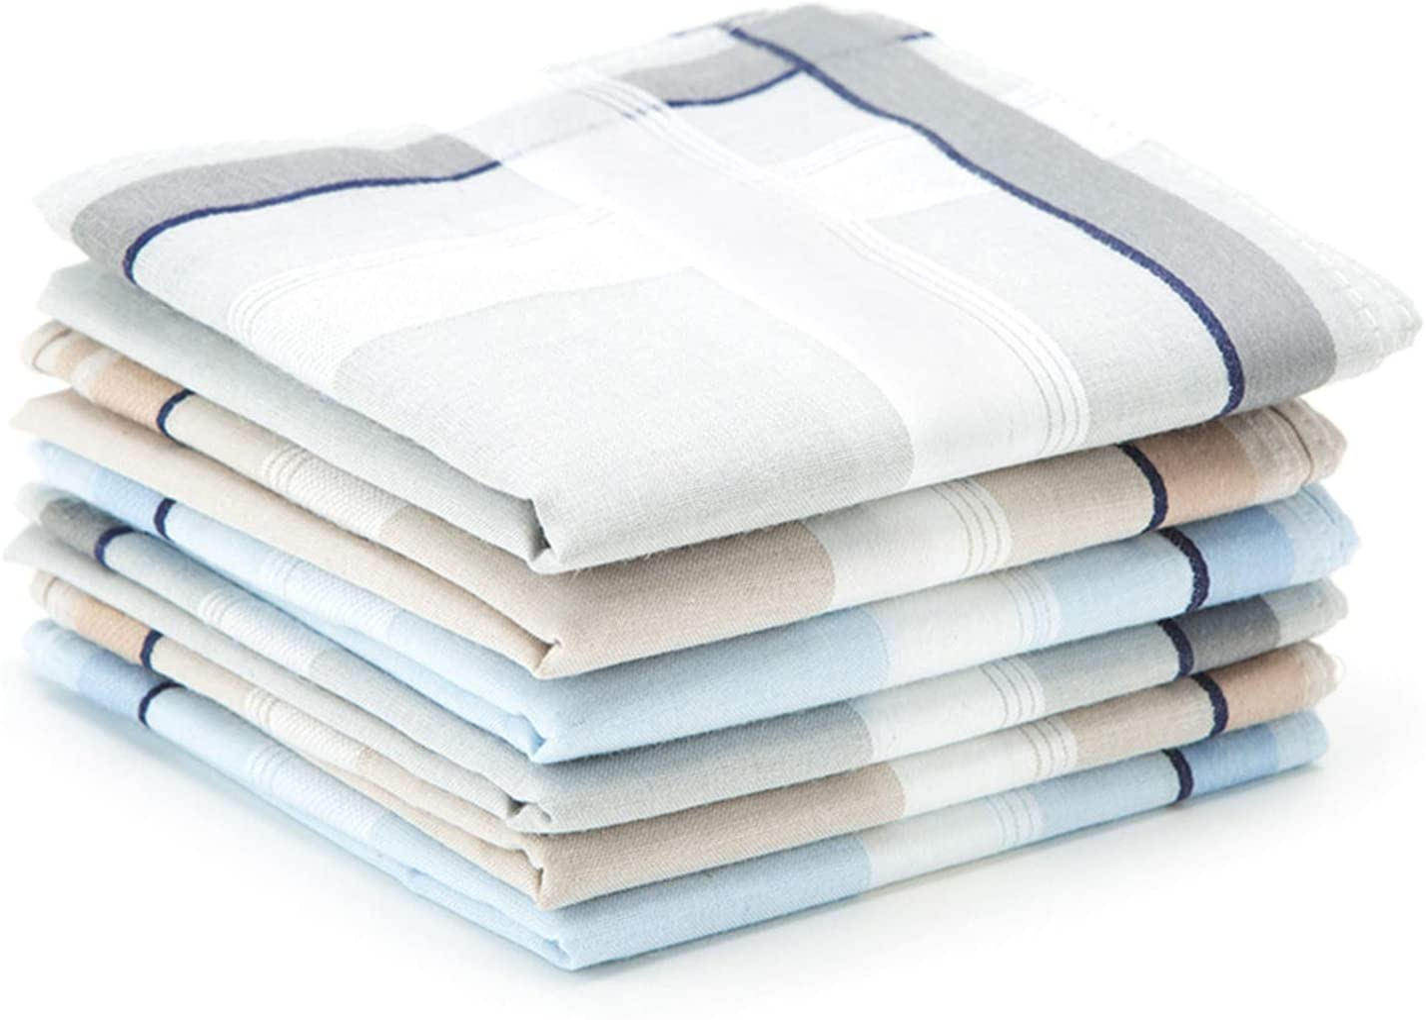 Gentlemans set of 13 white handkerchief hankies STYLE is Edwardian  Made in czech Republic Wedding gift best mans gift Accessories.